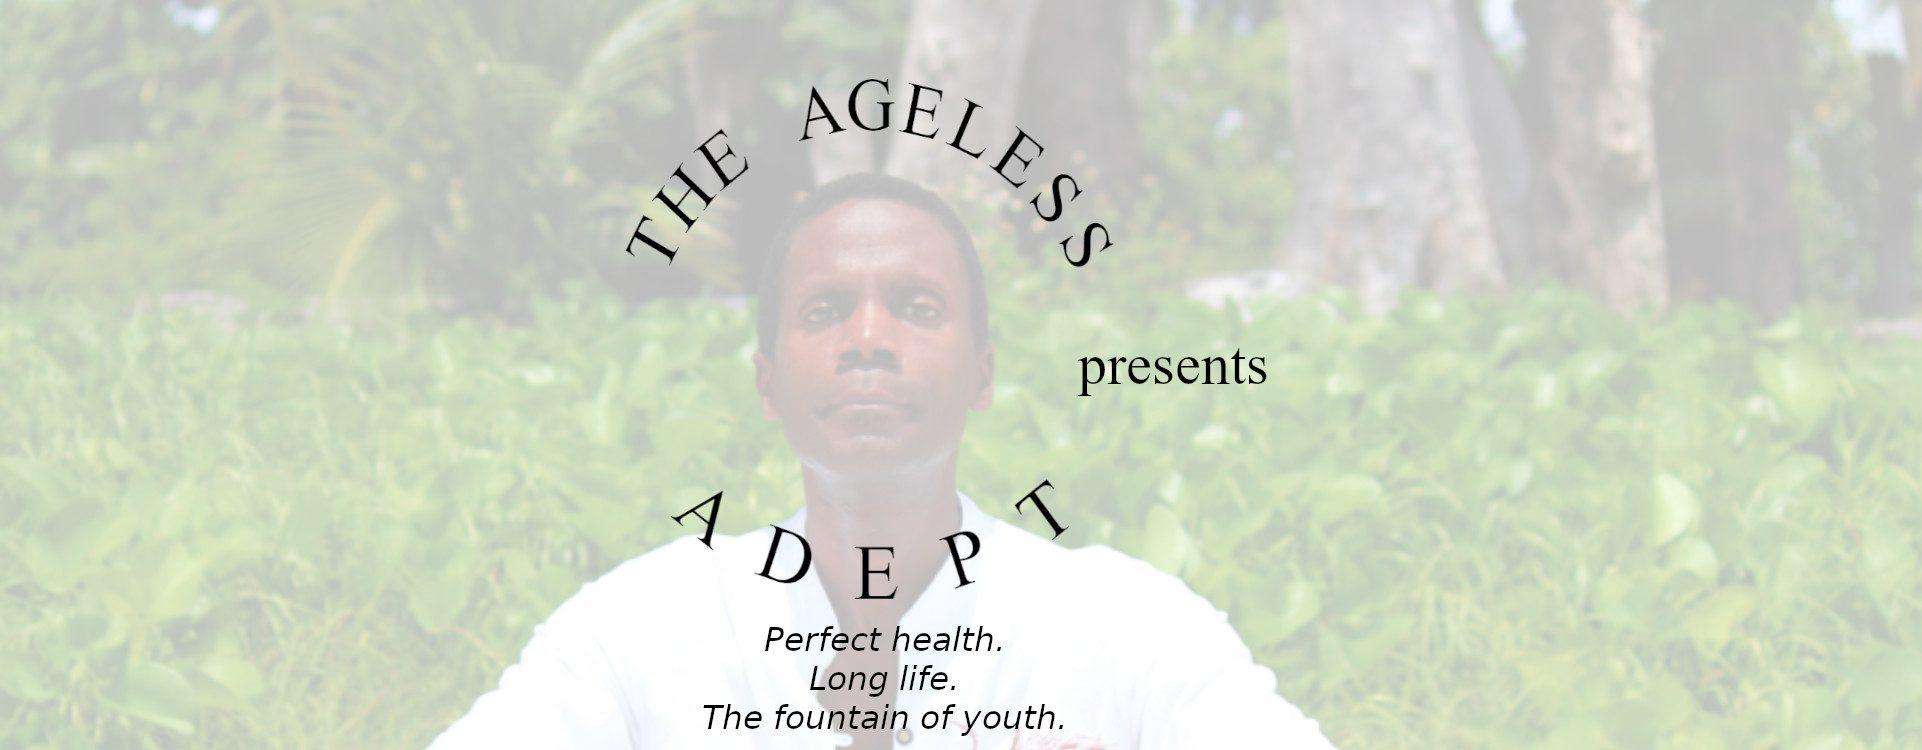 The Ageless Adept™